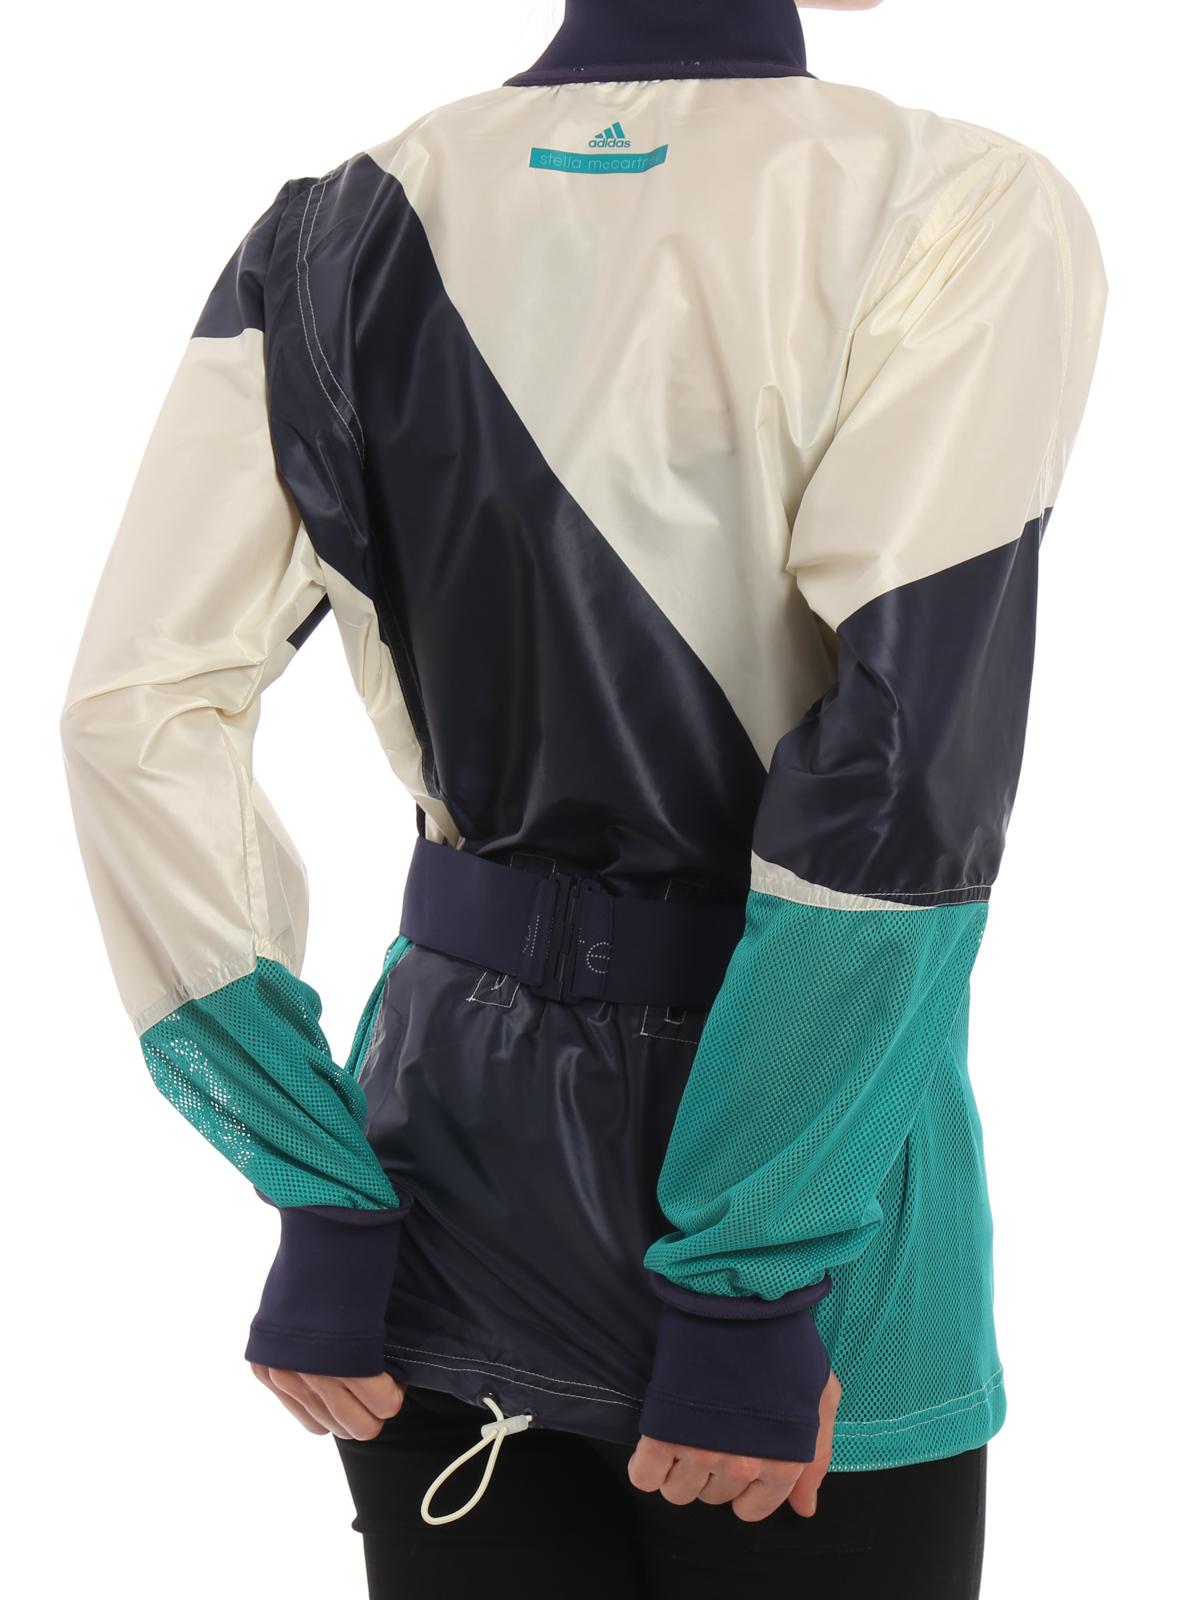 efa6da513a Adidas by Stella McCartney - Run Kite running jacket - casual ...